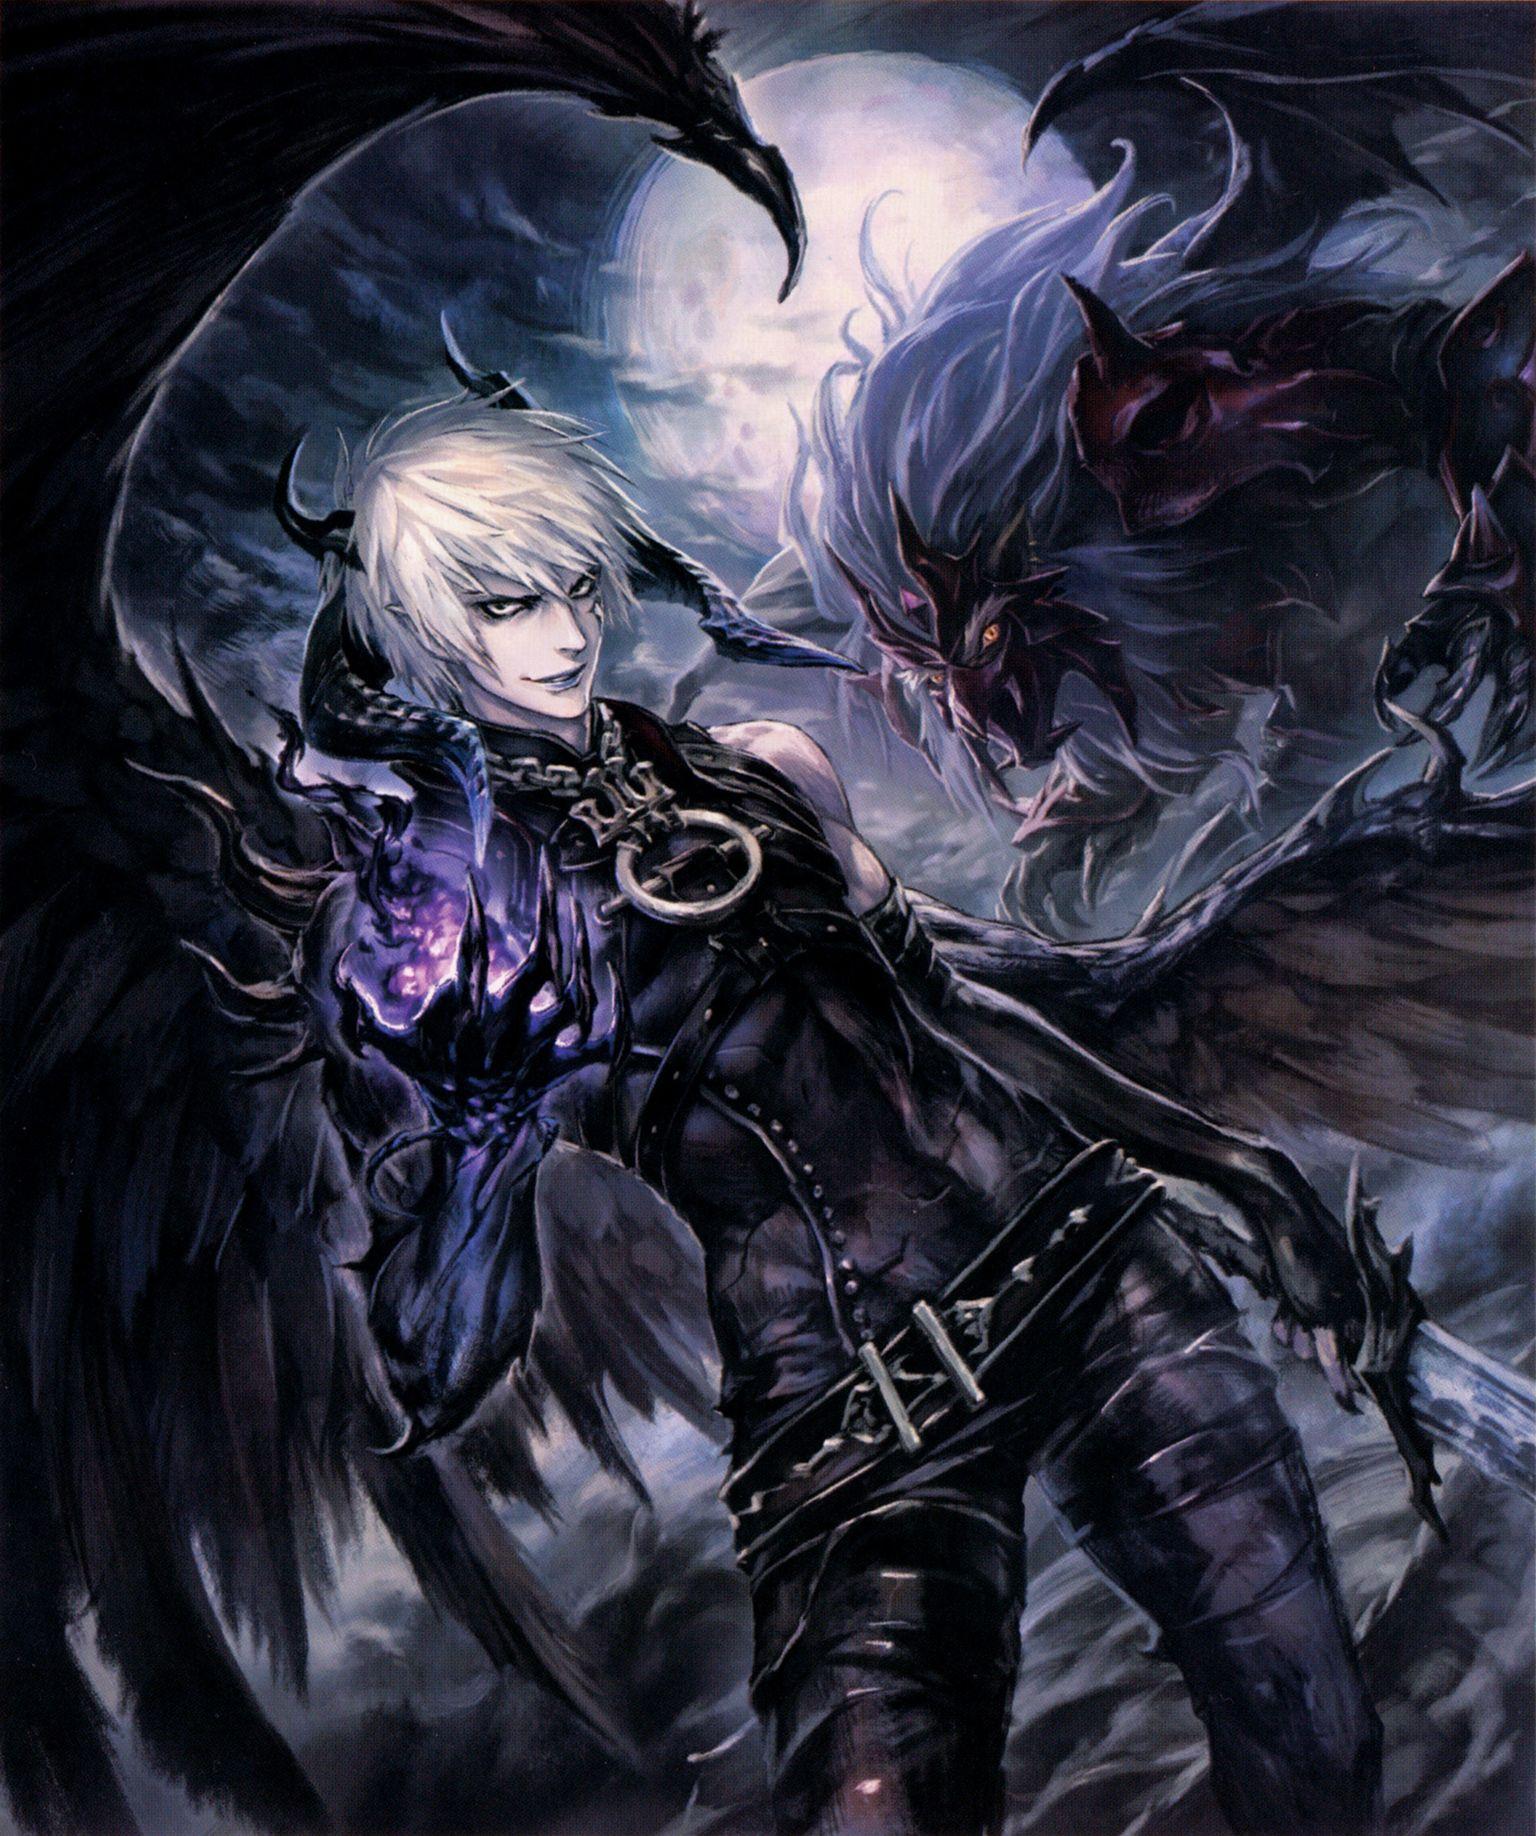 Картинка аниме демона